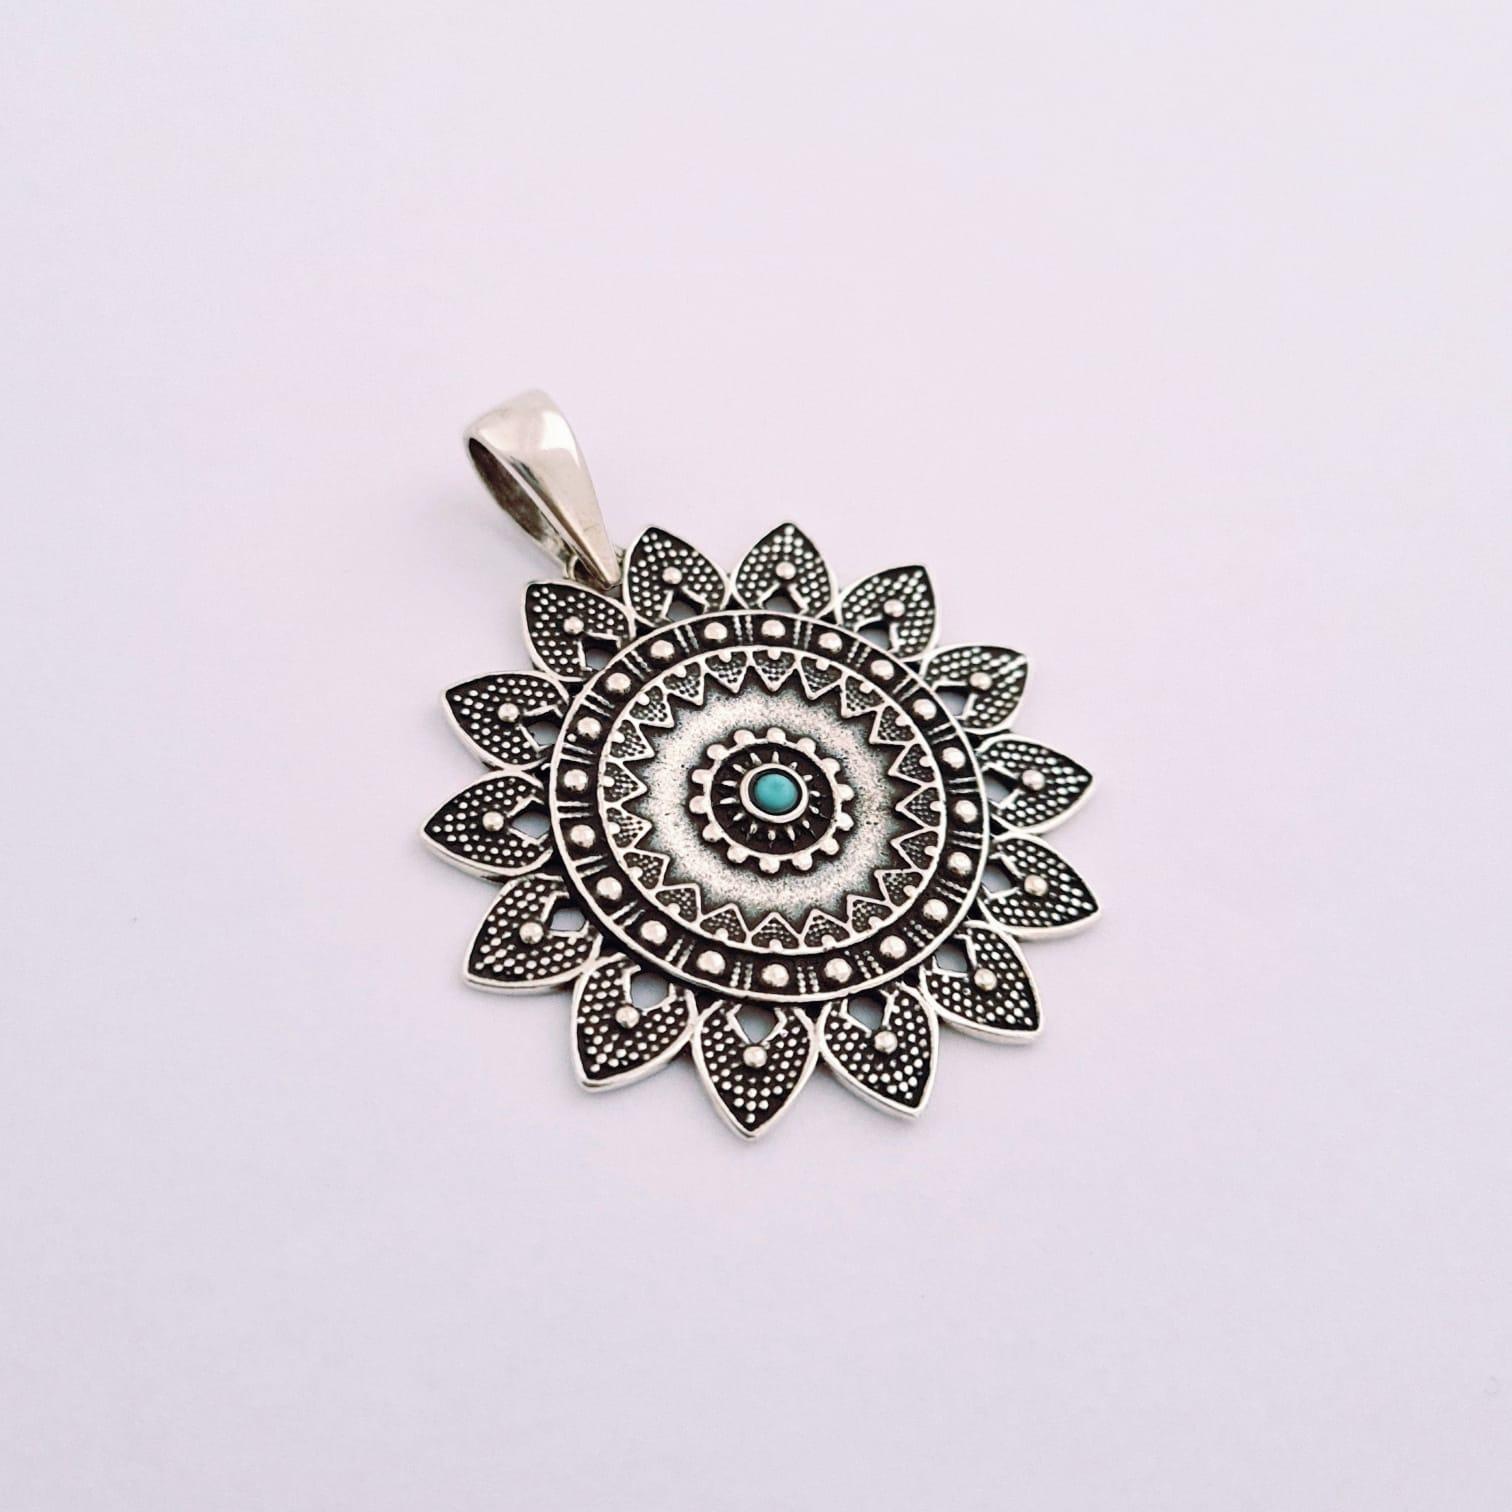 Pingente de Prata Mandala Floral